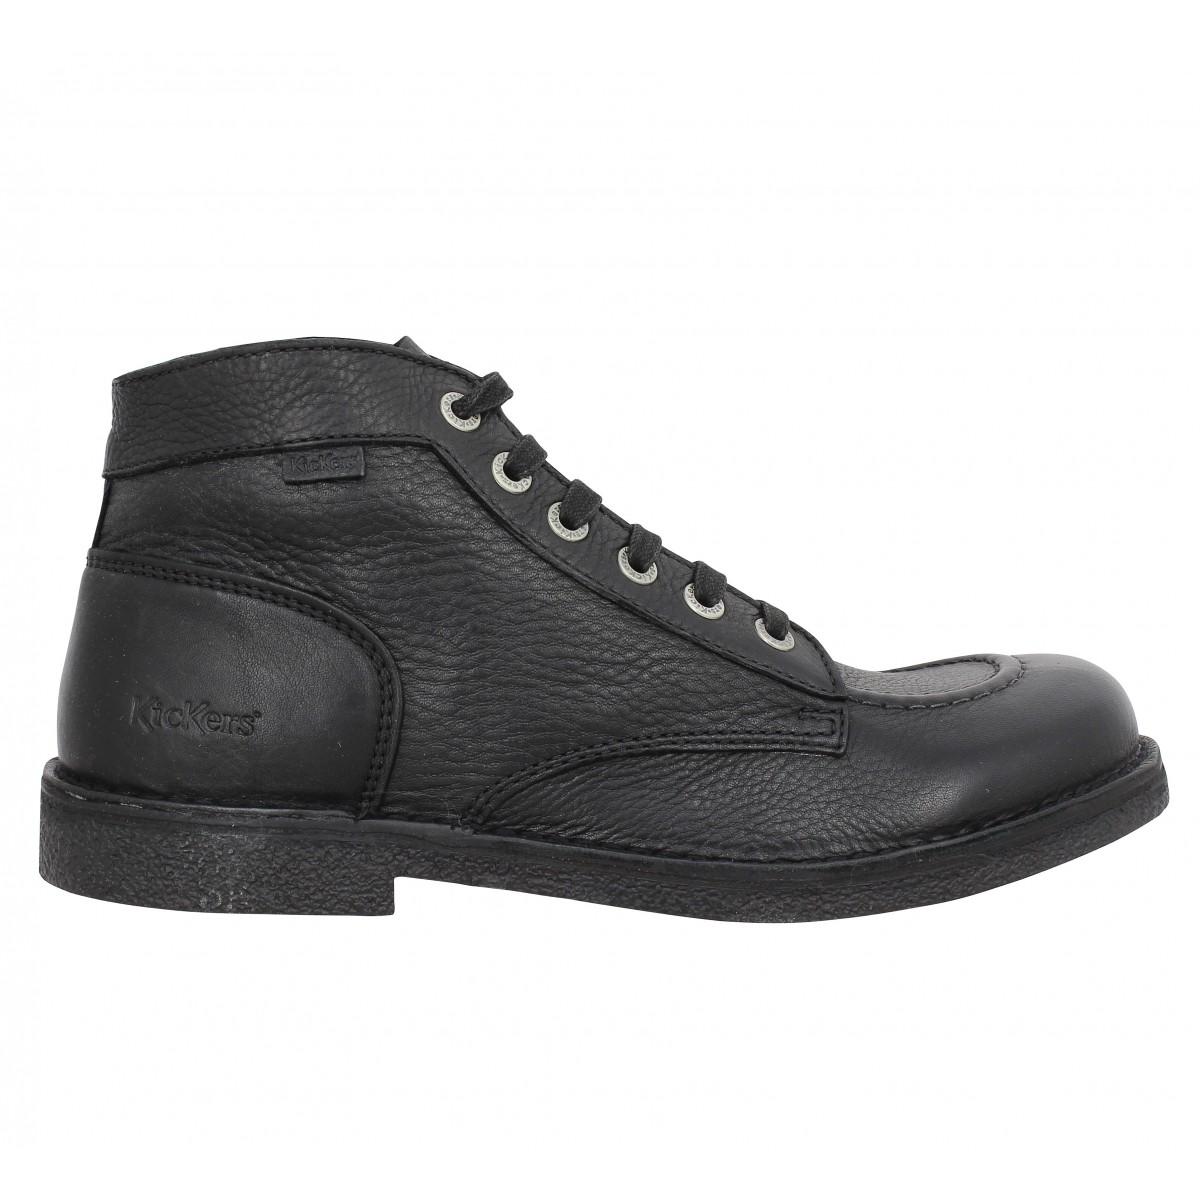 Chaussures Kickers Kick 33 noires Casual enfant Lje1yzfIC3